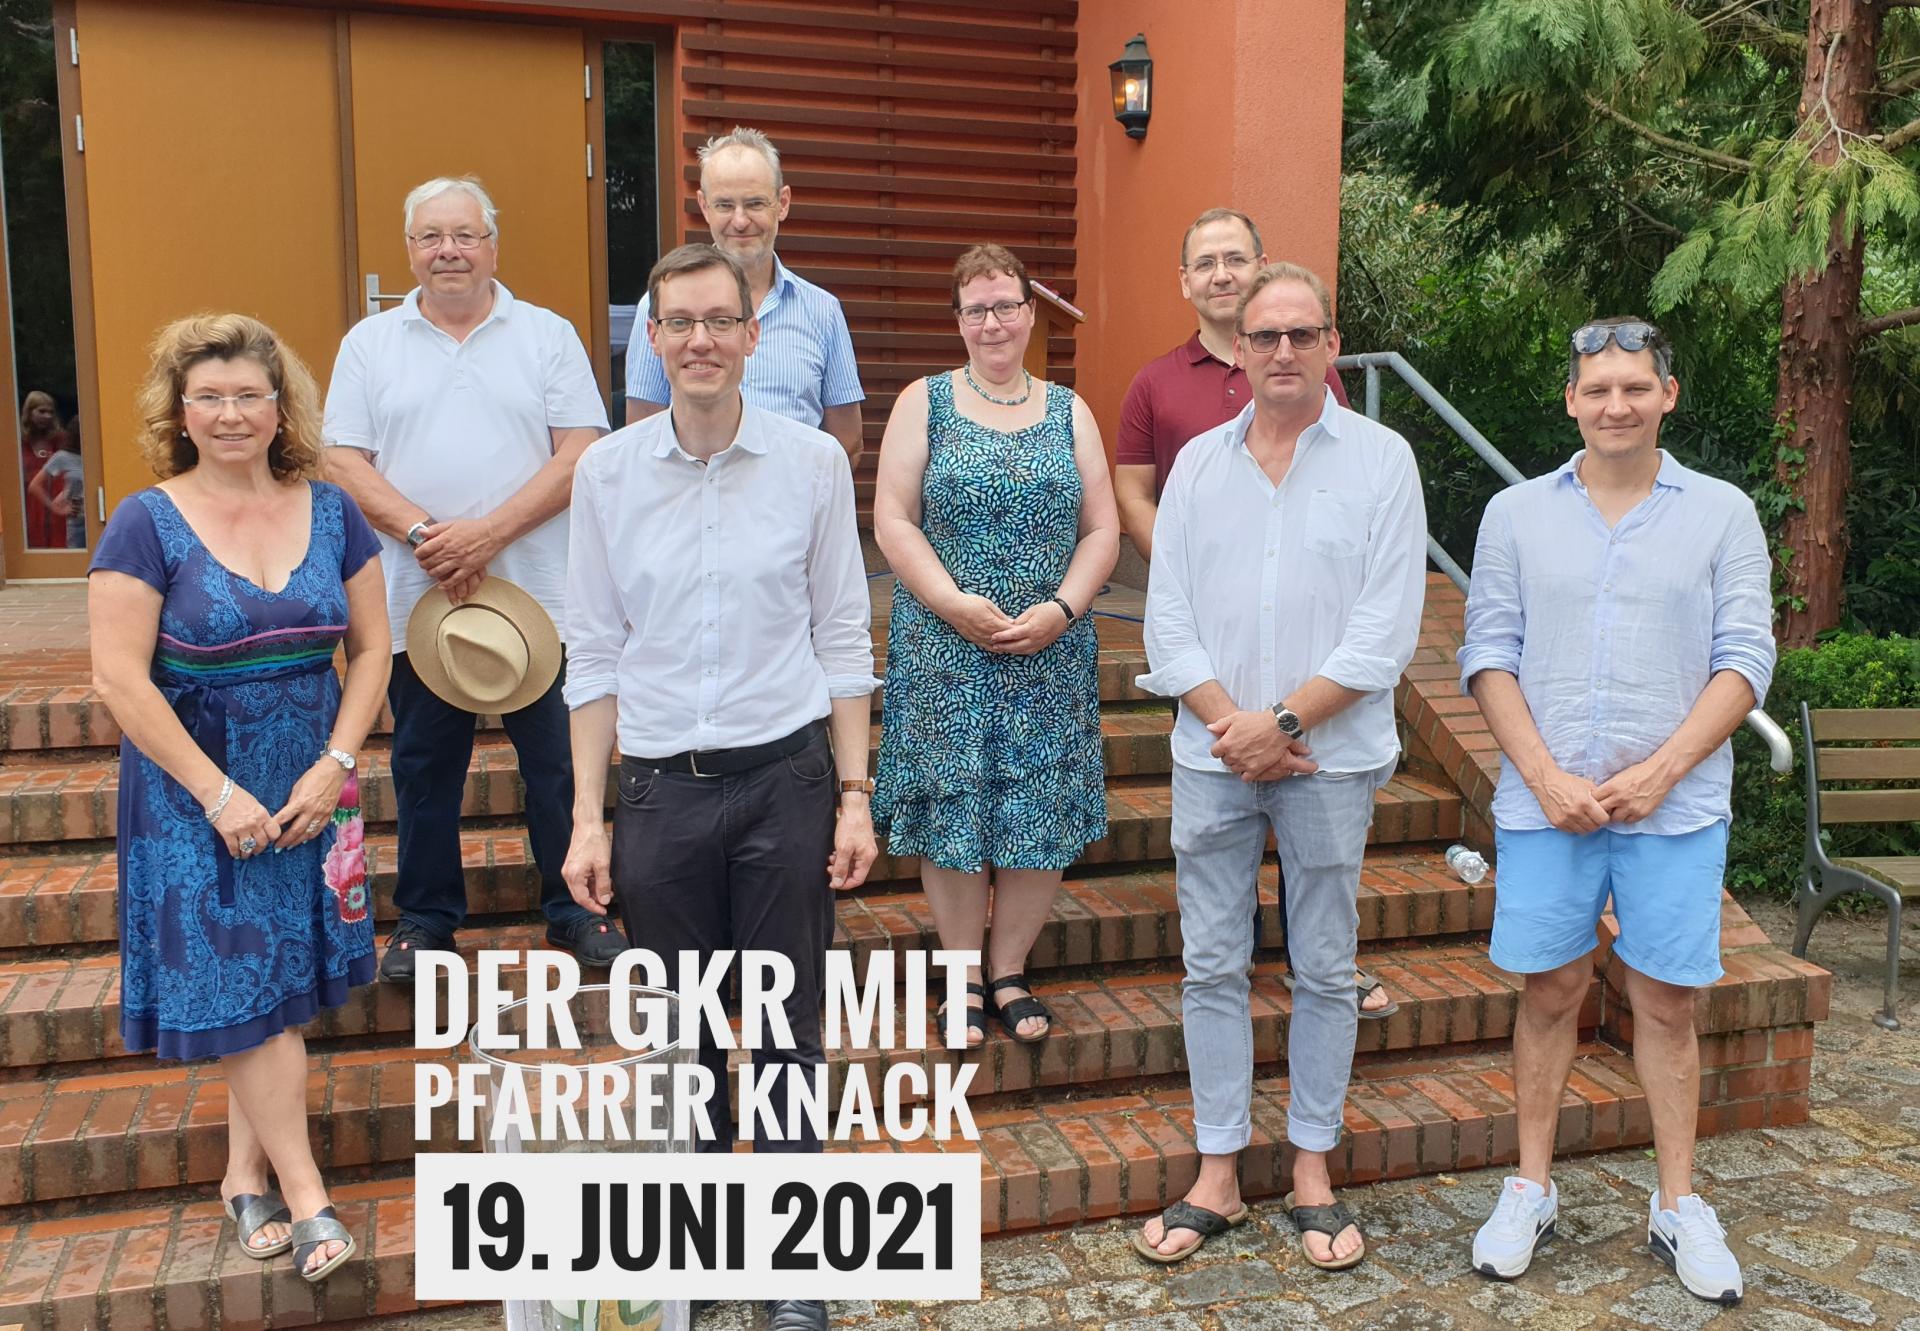 Der GKR mit Pfarrer Knack